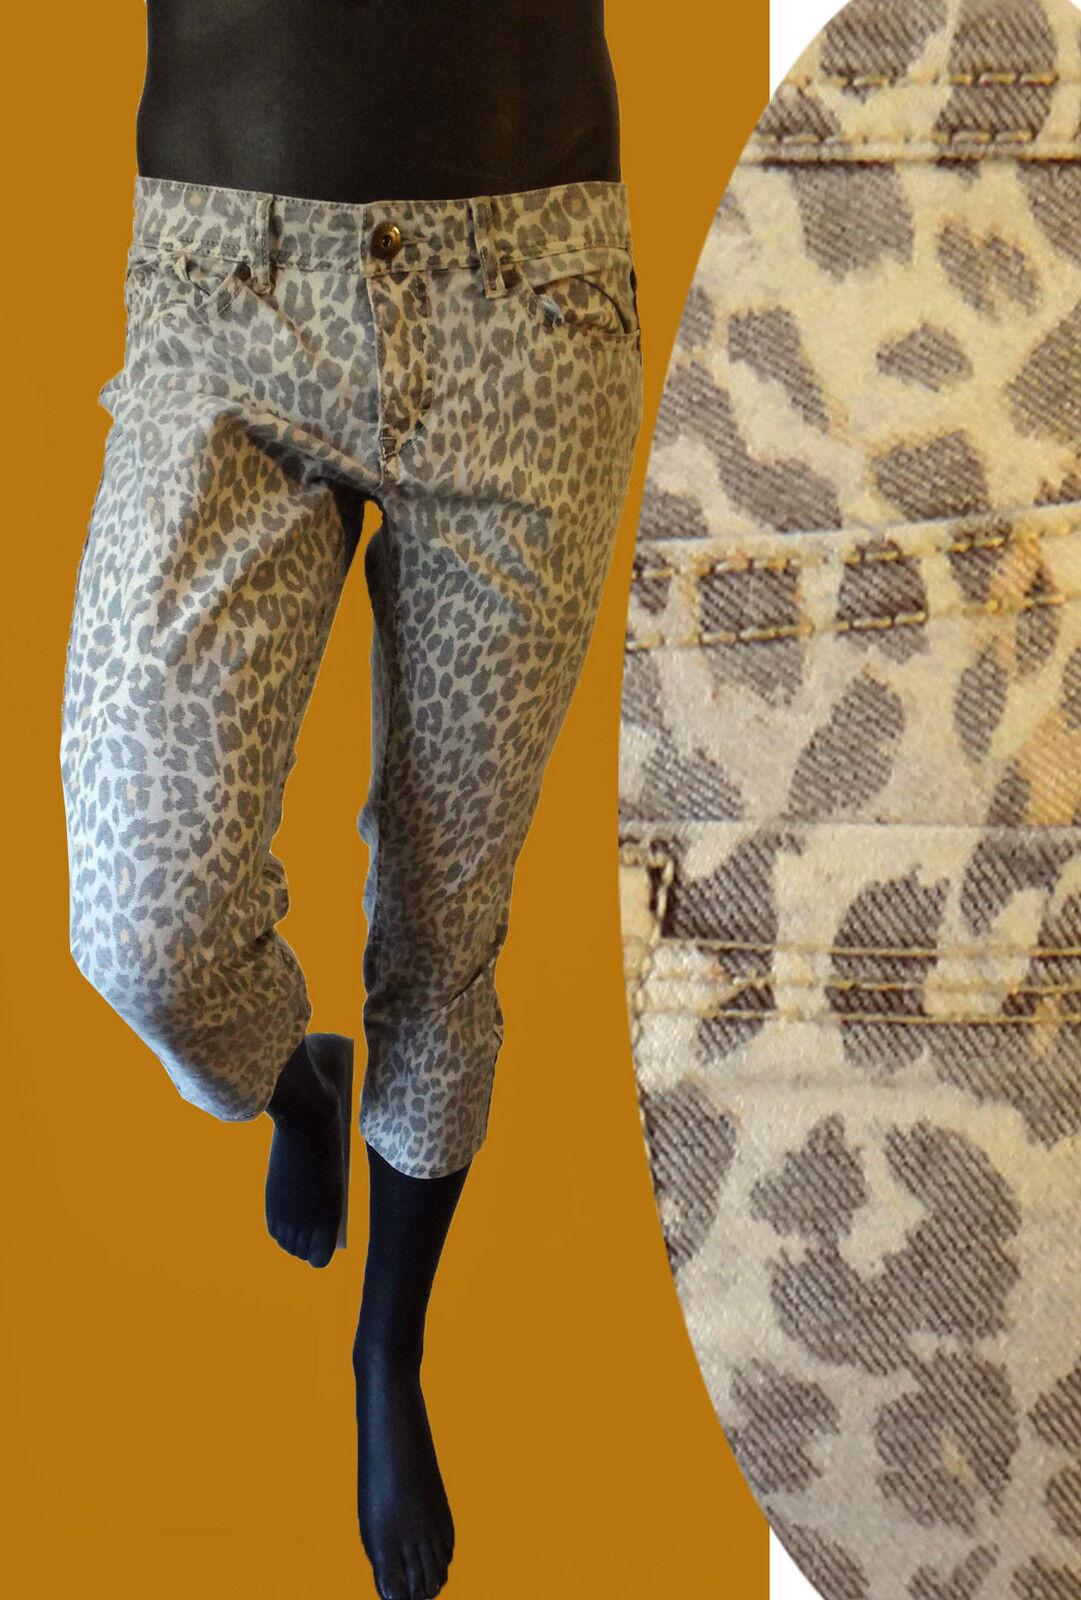 Leopard print animal crop capri 10 33 short clamdigger denim jean stretch retro